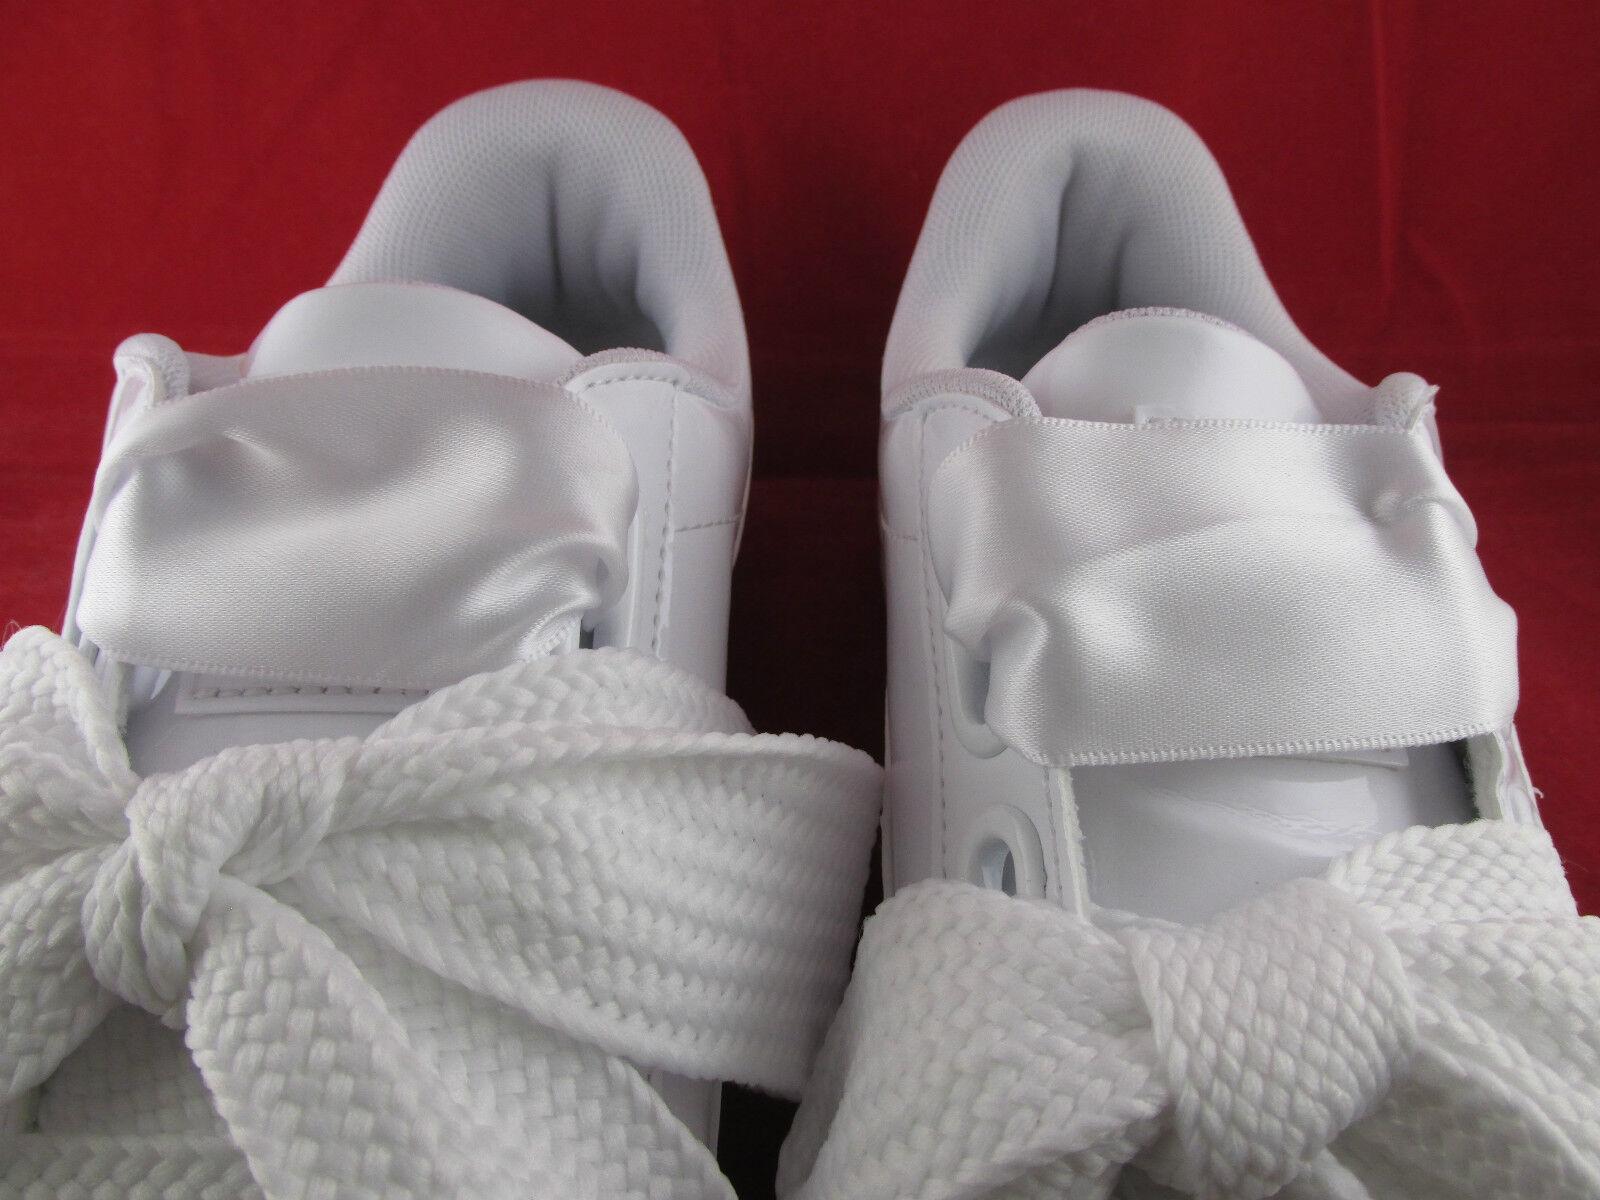 Puma Basket 3 Heart Patent Woman Weiß 3 Basket 4 5 6 All Größes 363073-02 SportsLocker b8aca9